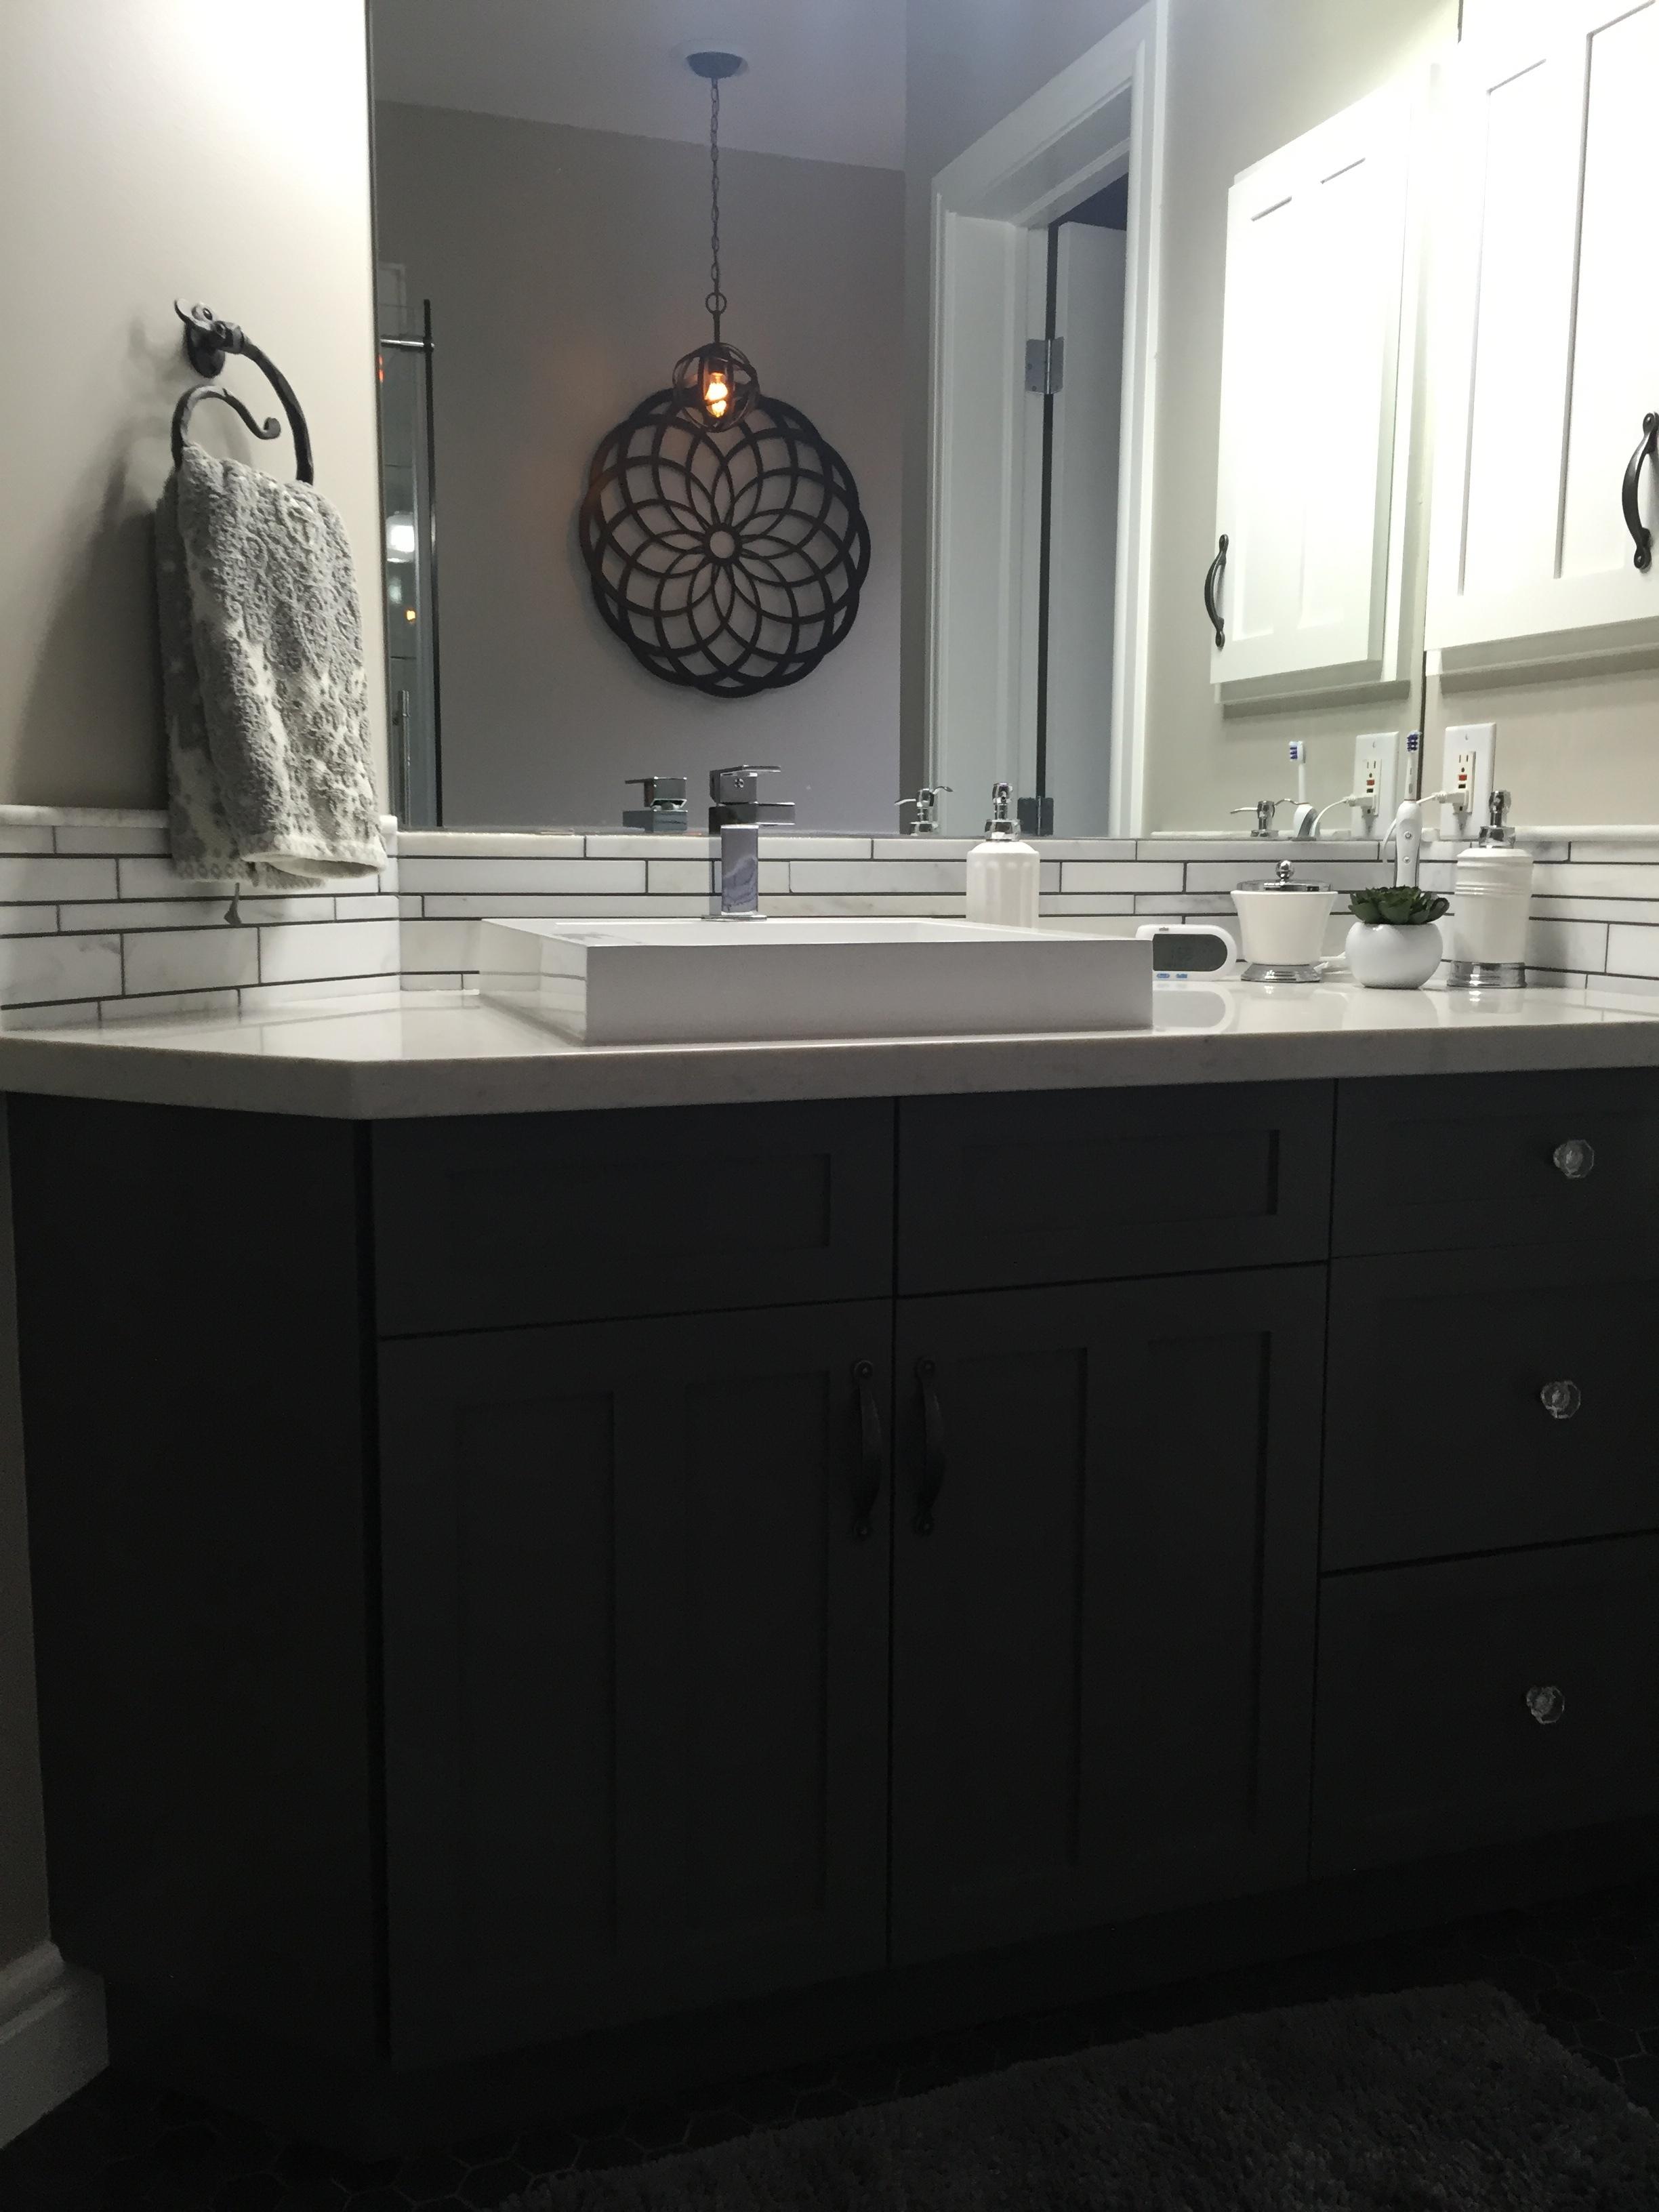 Dark base cabinets, white quartz, marble backsplash.